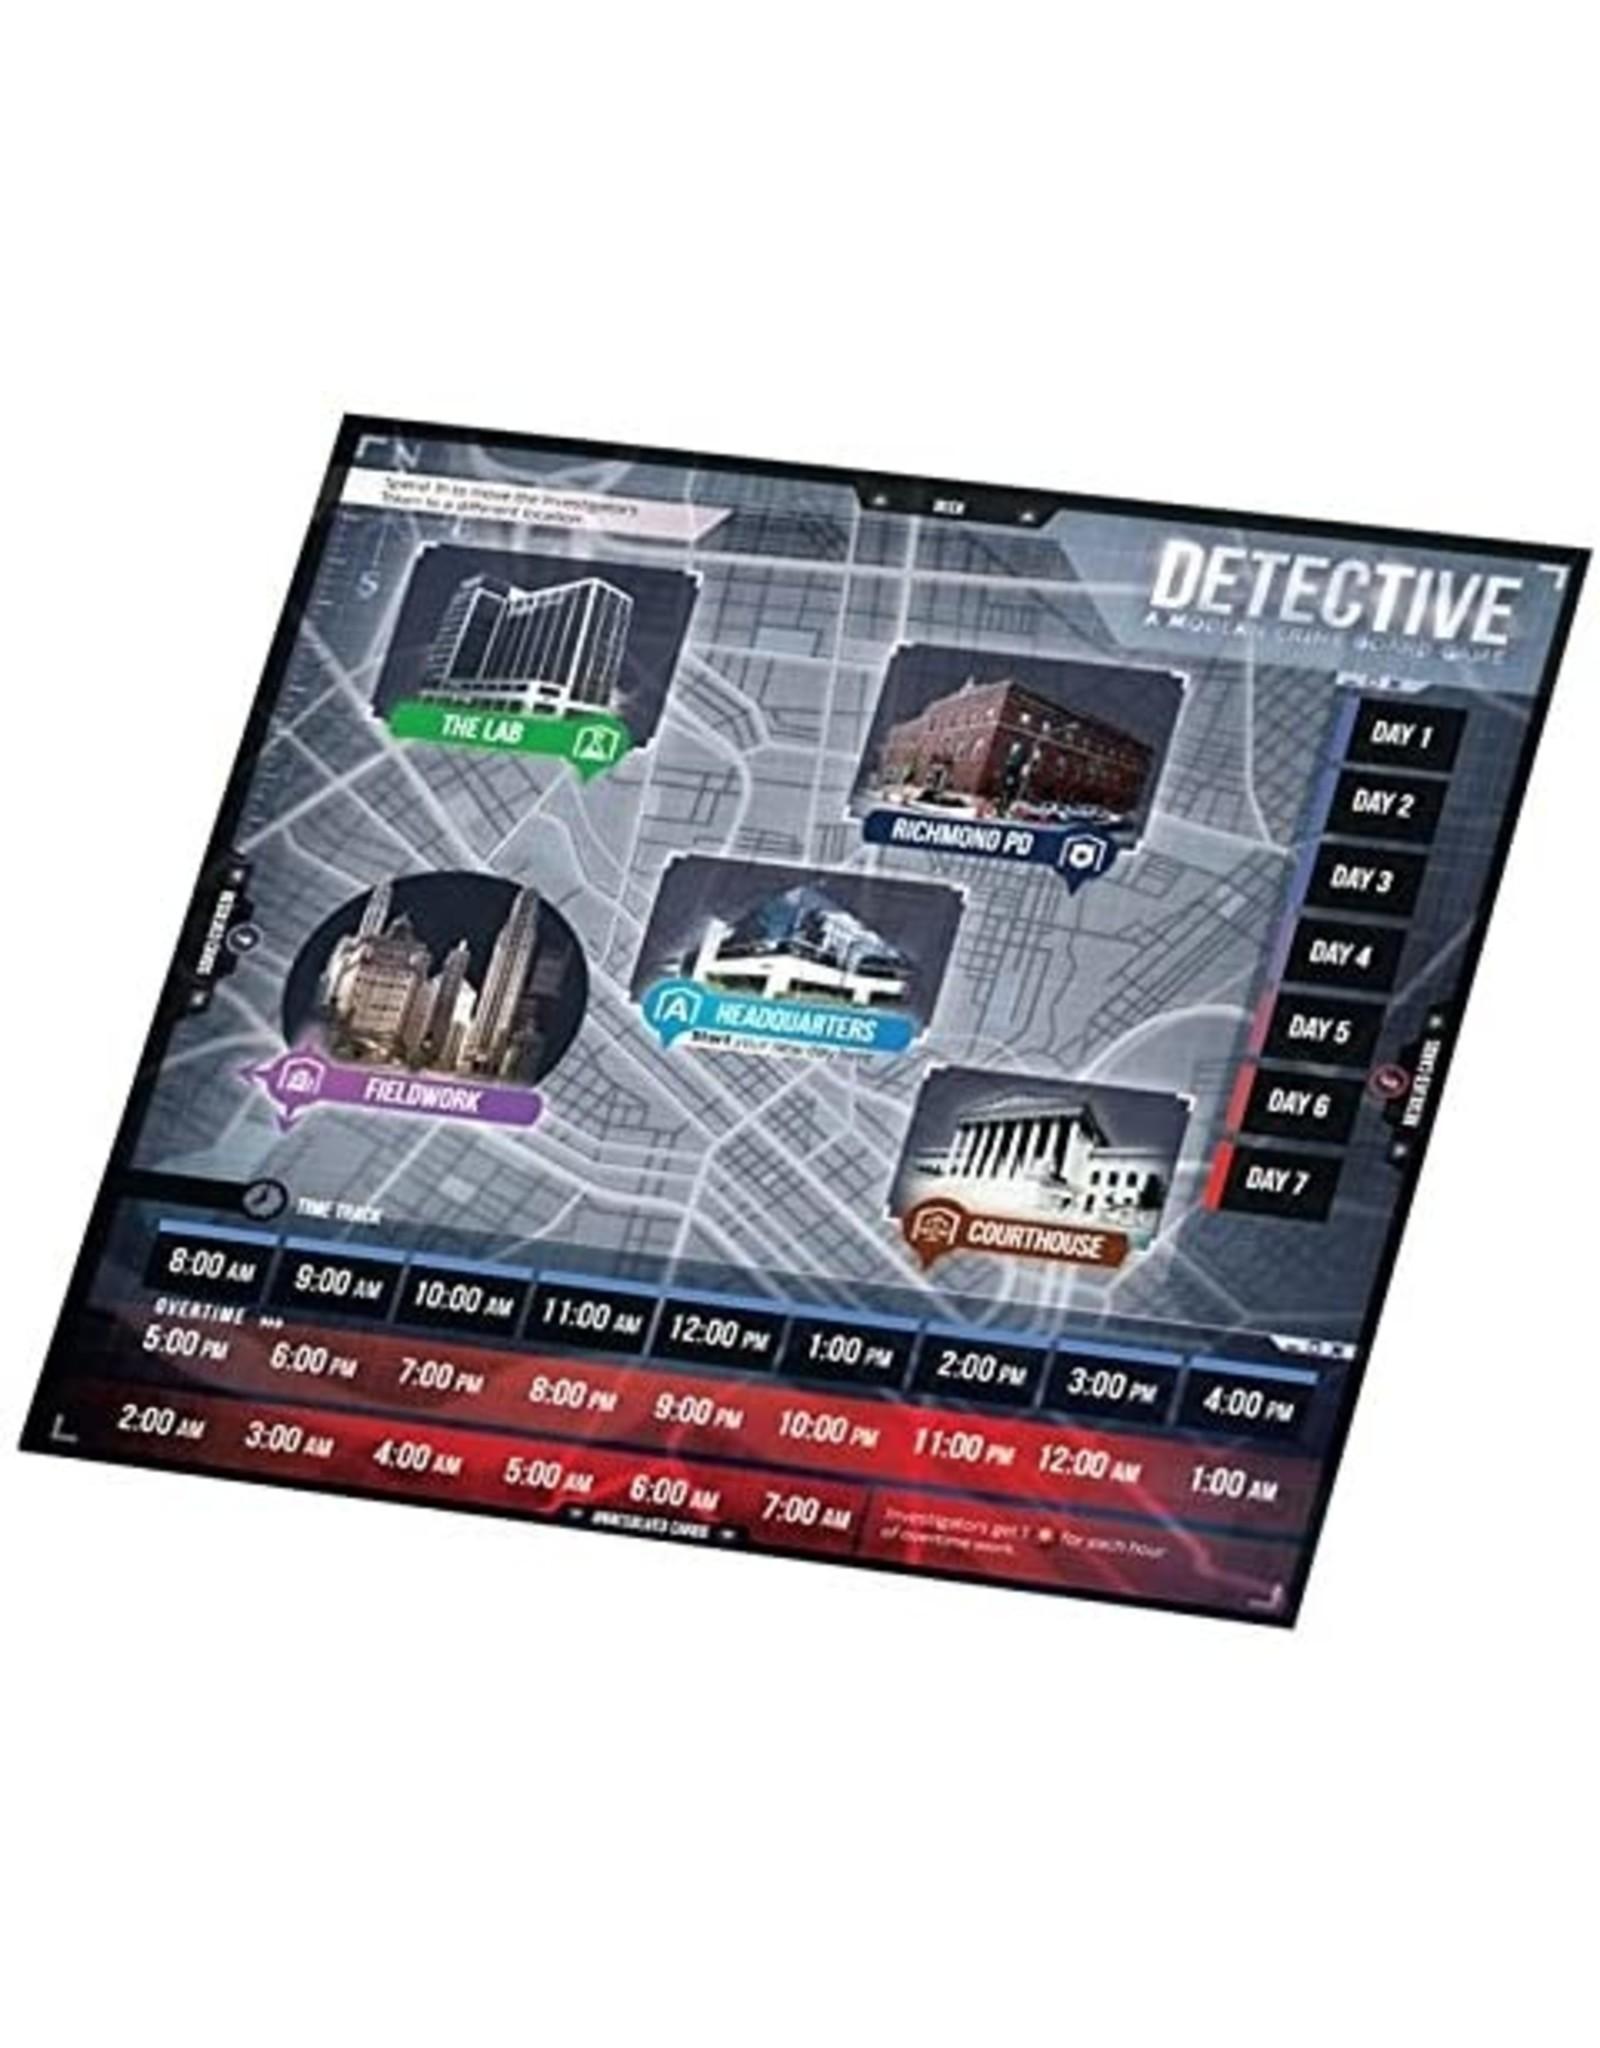 Detective: A Modern Crime Game